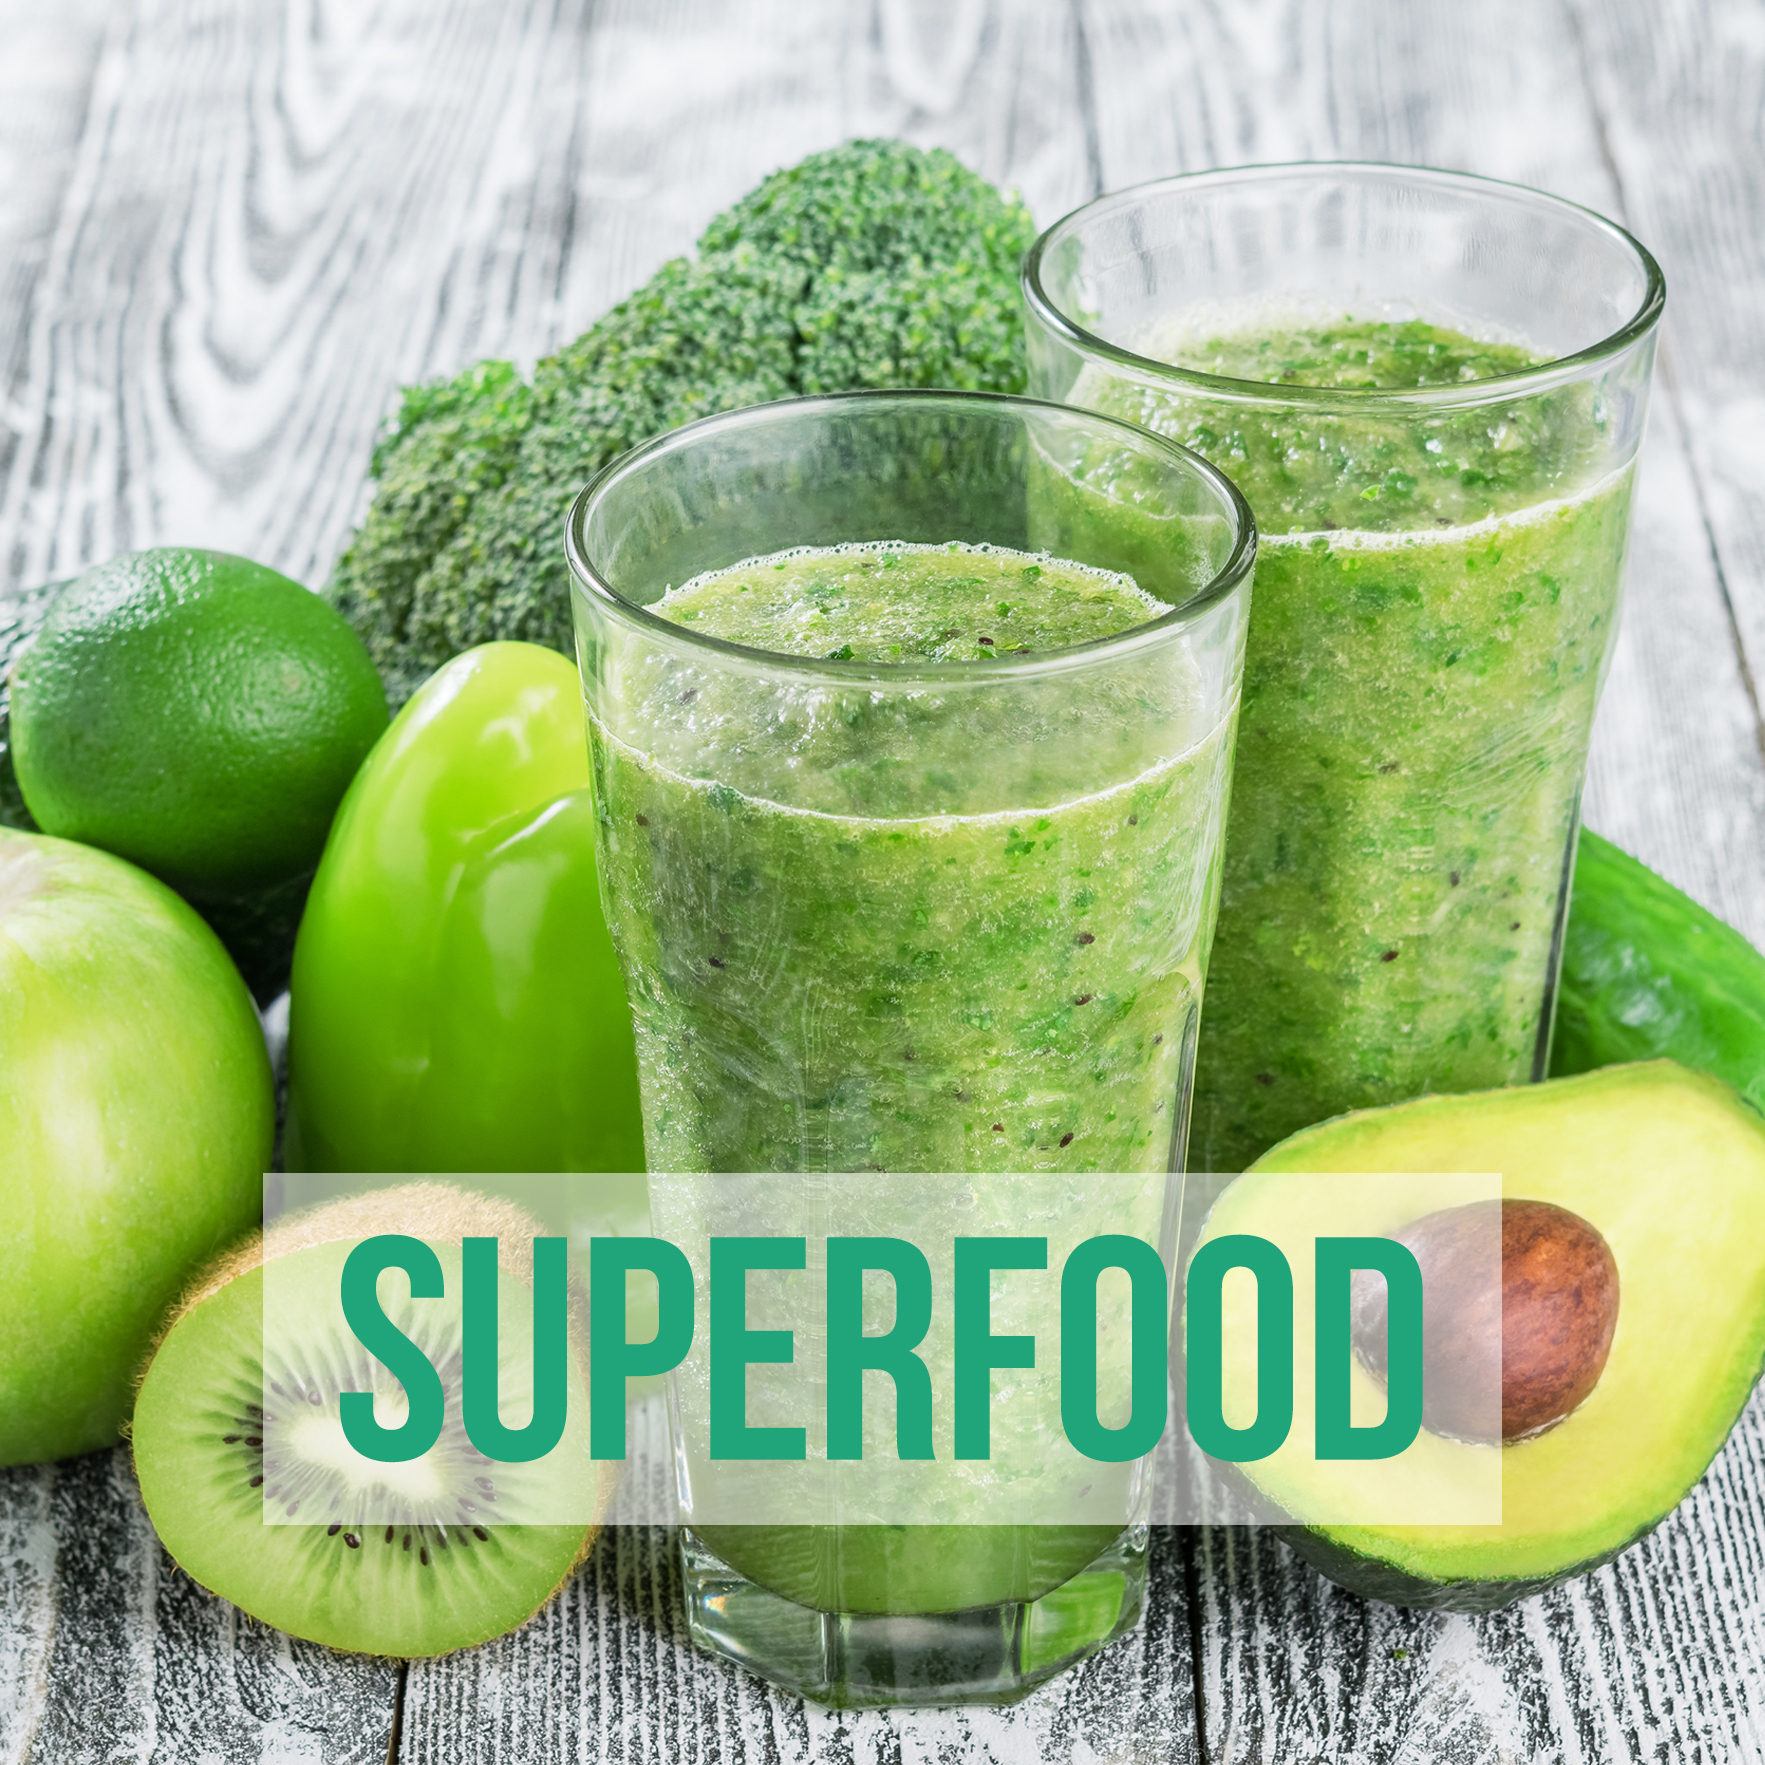 Superfood - Chlorella